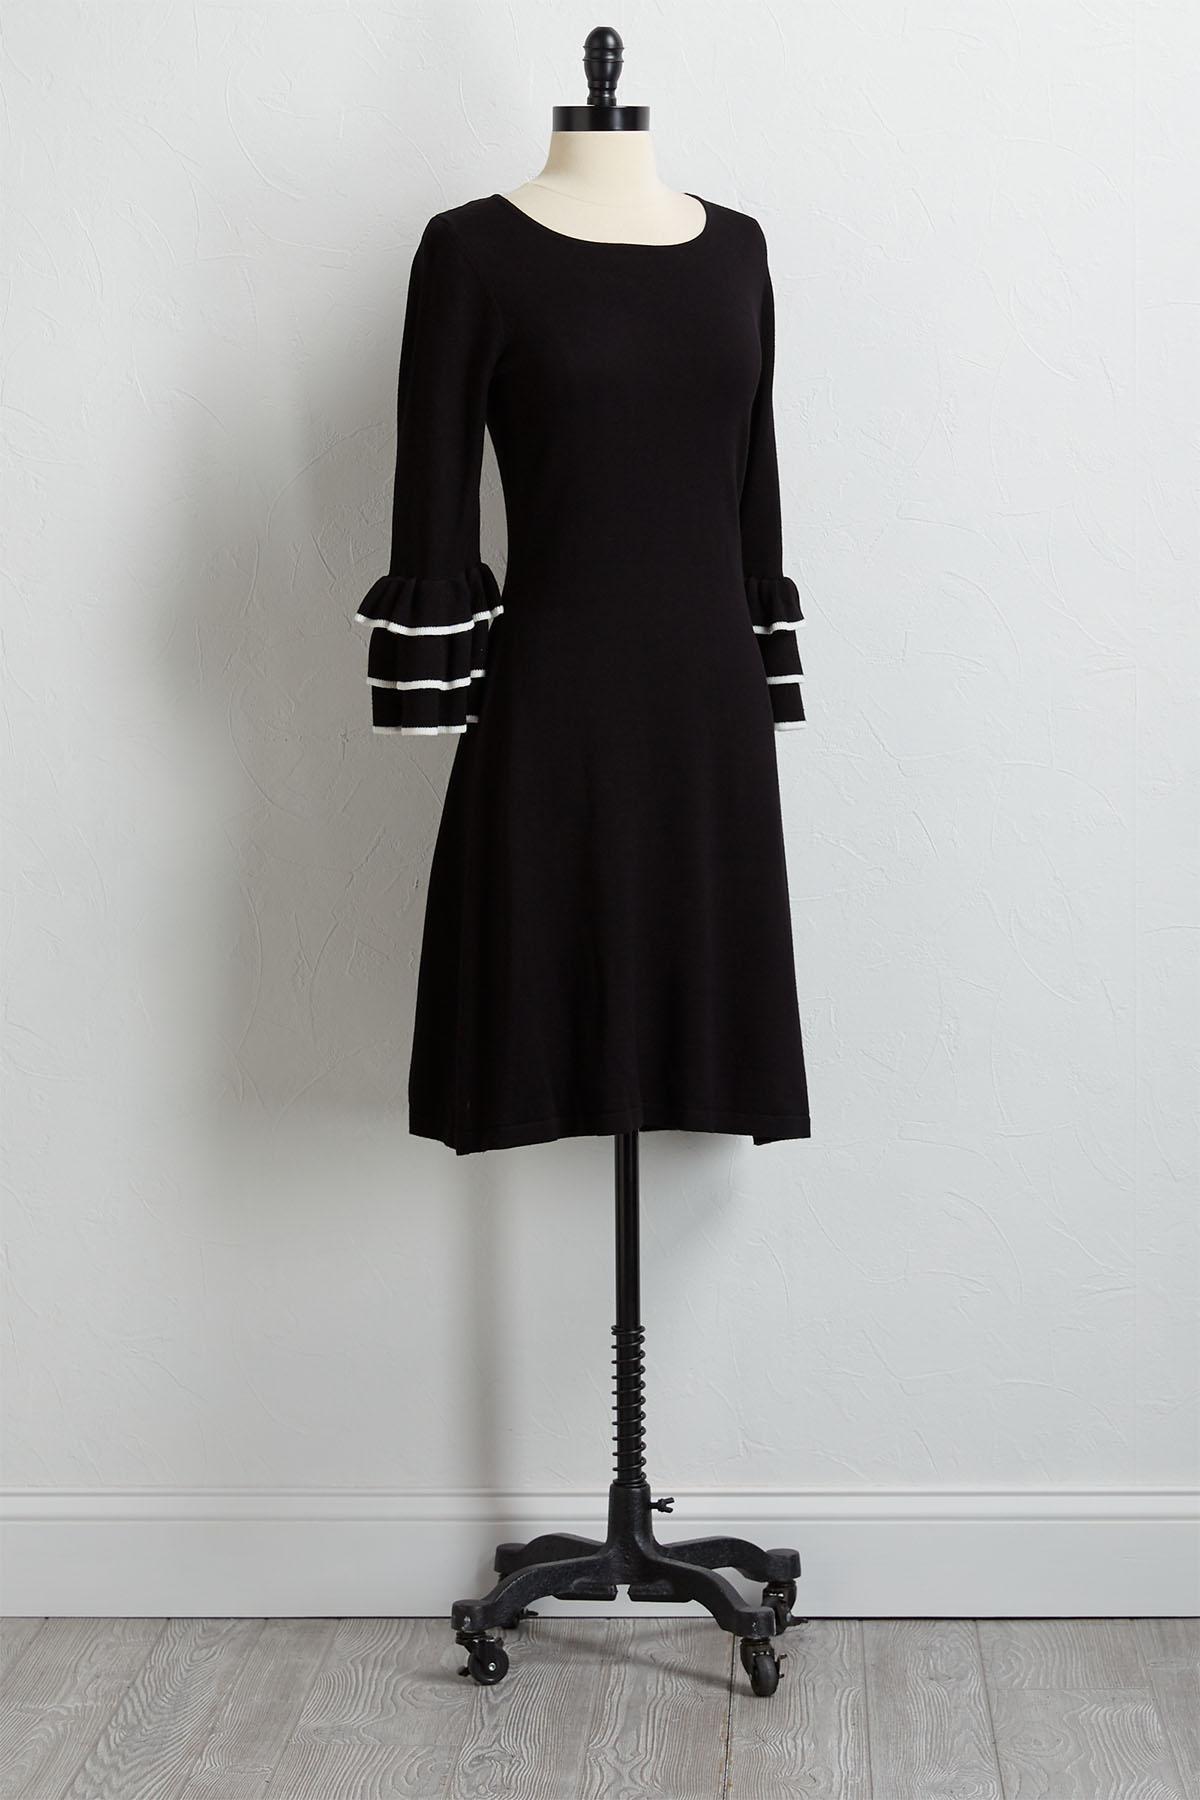 Black And White Ruffled Sweater Dress